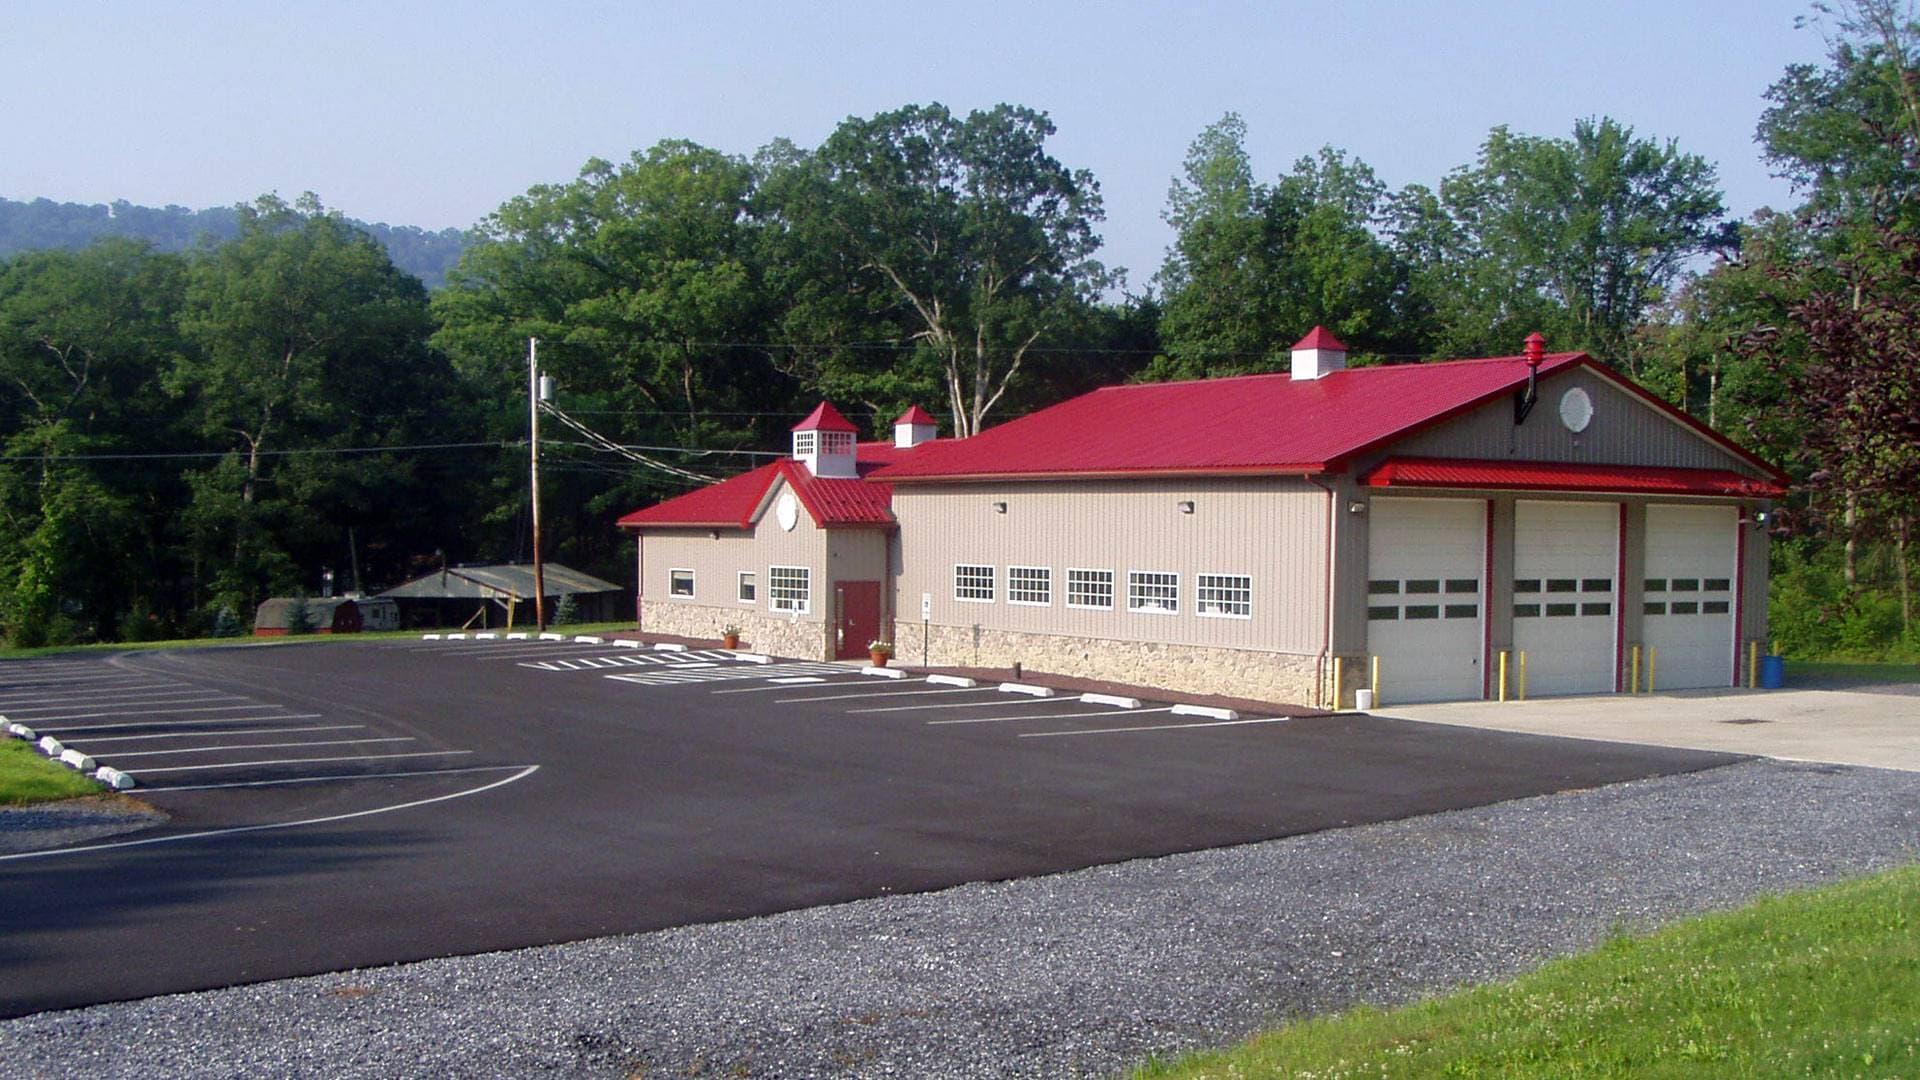 Camp Strause Fire Company